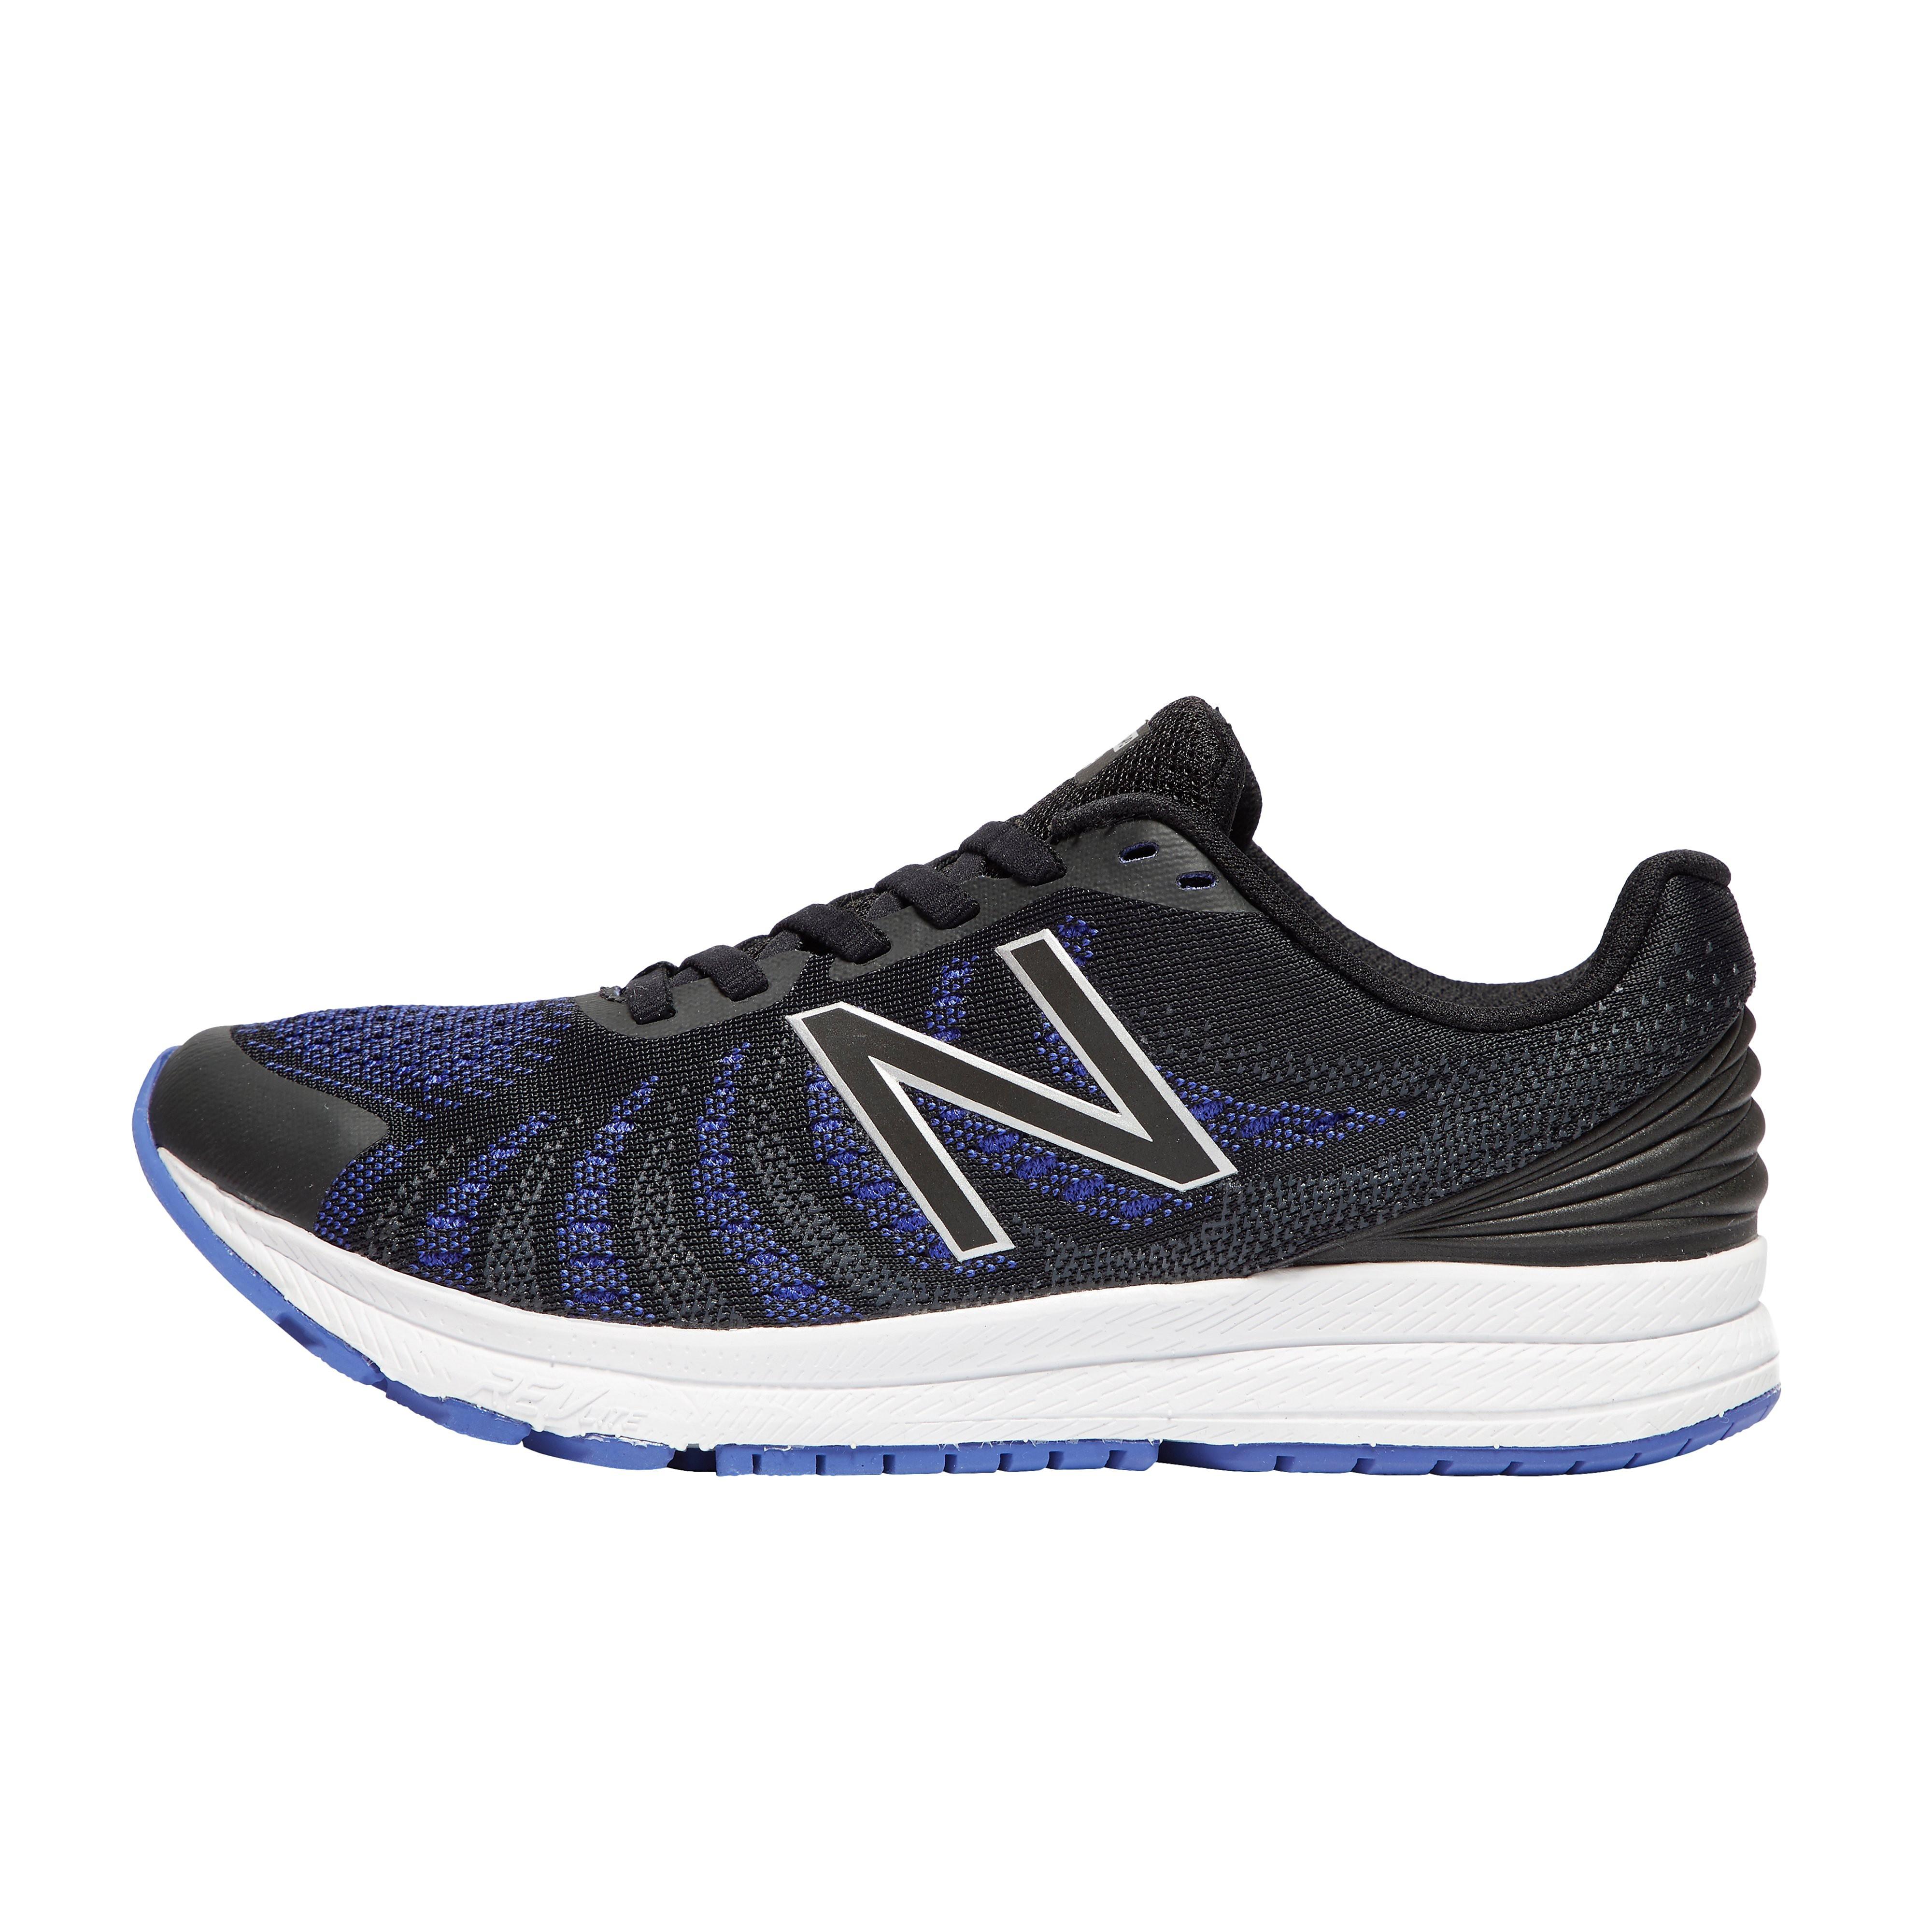 Women's New Balance FuelCore Rush v3 Running Shoes - Black, Black